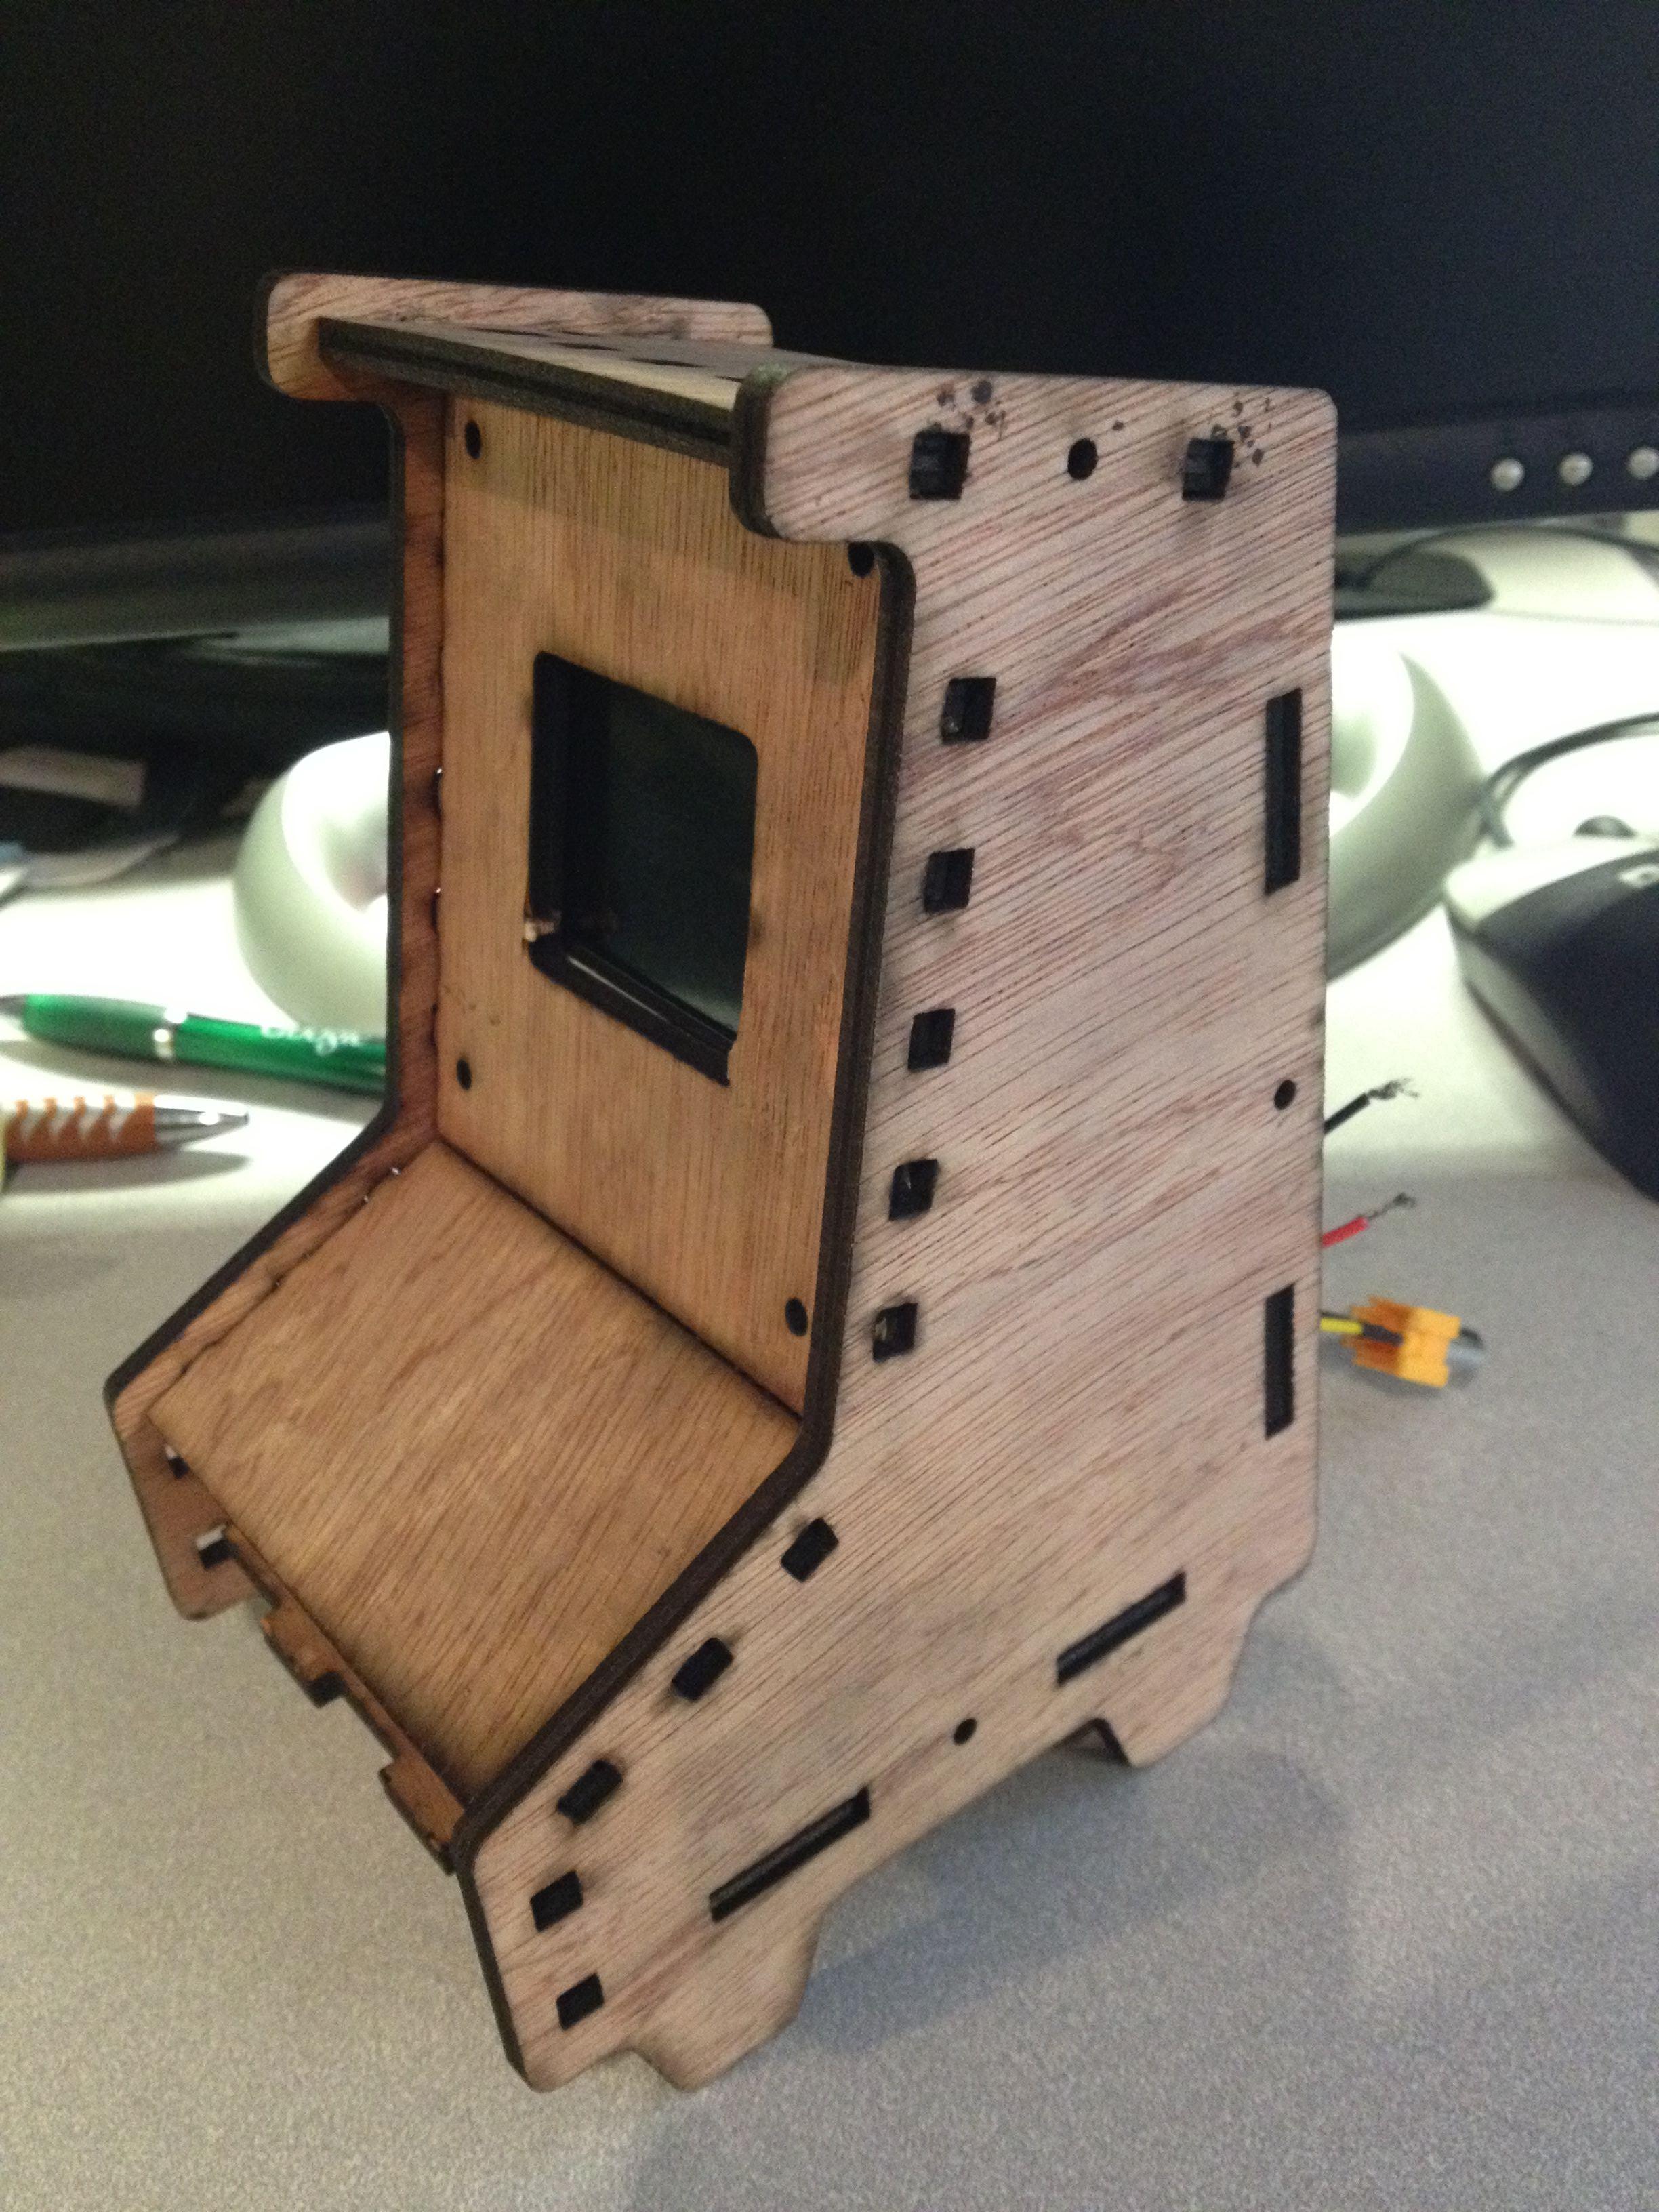 Laser Cut Mini Arcade Cabinet xpost - Raspberry Pi Forums